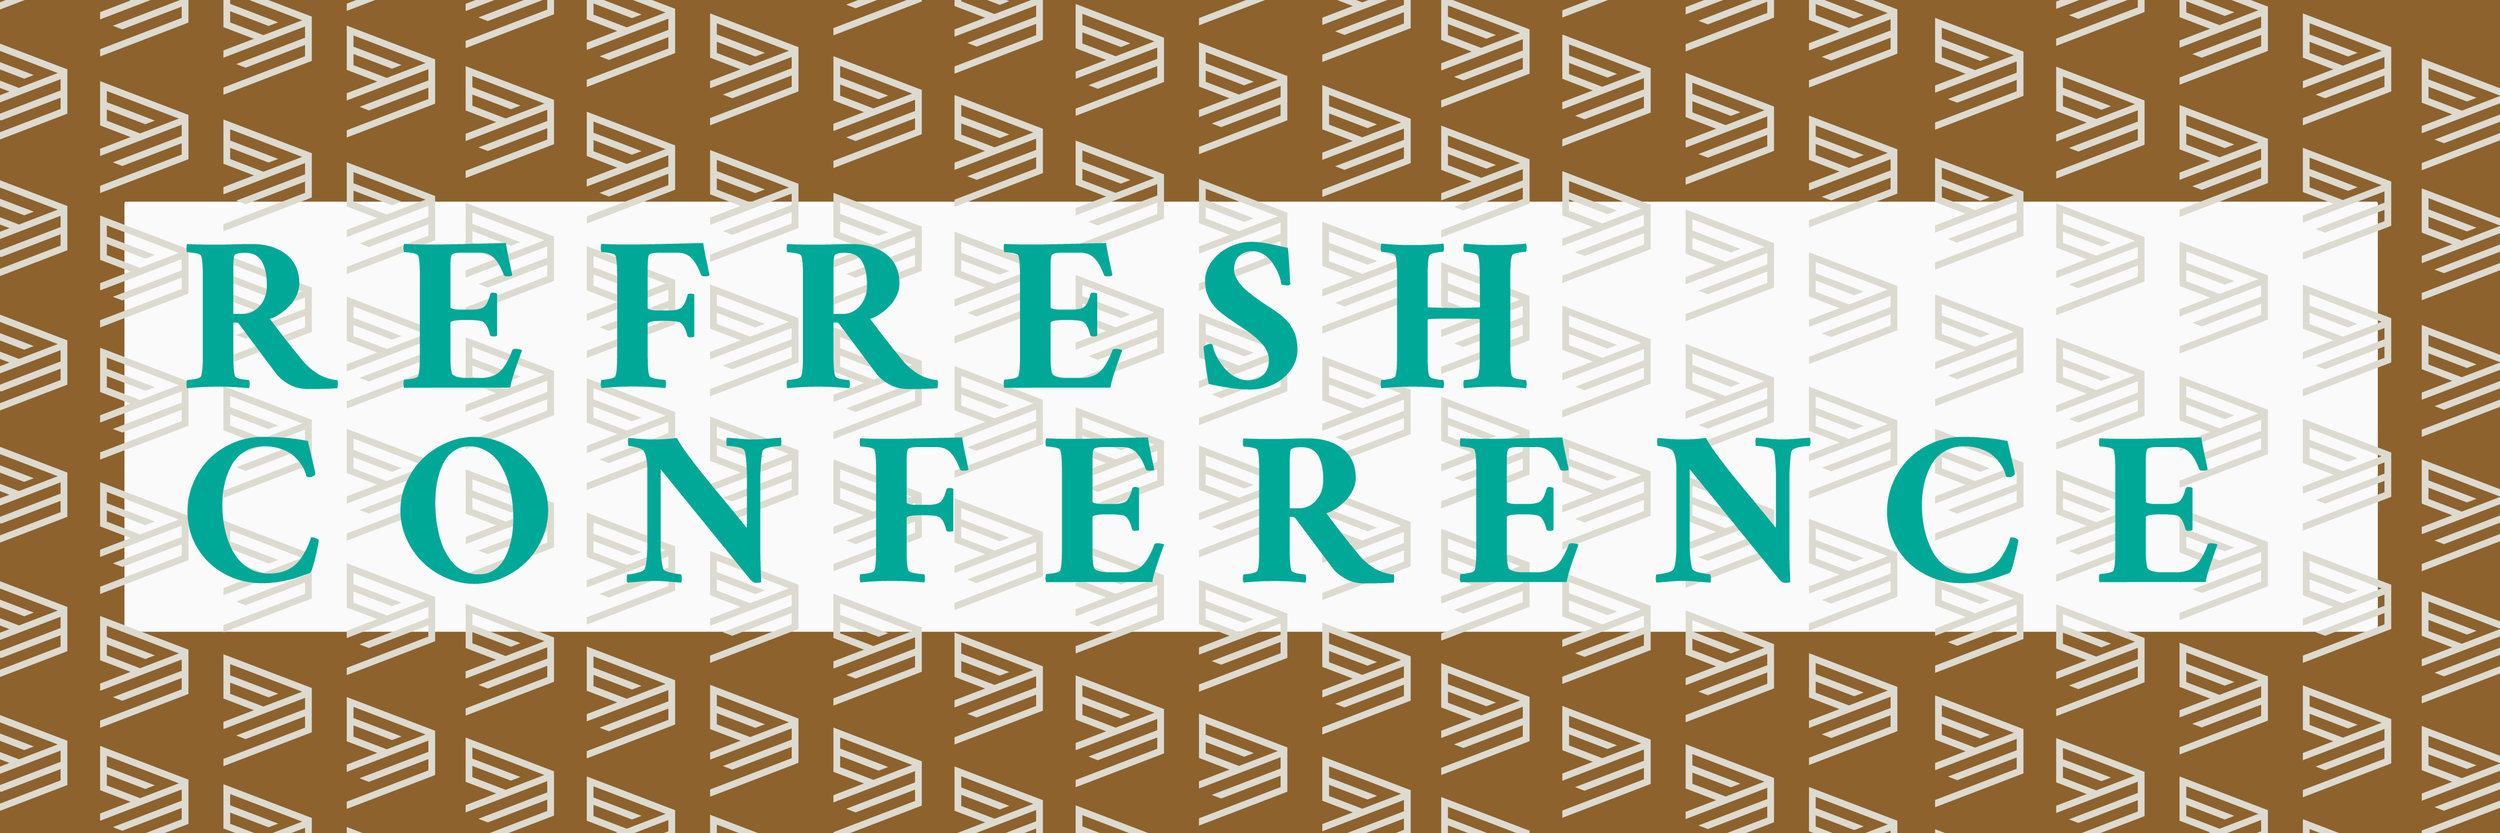 Refresh Conference.jpg